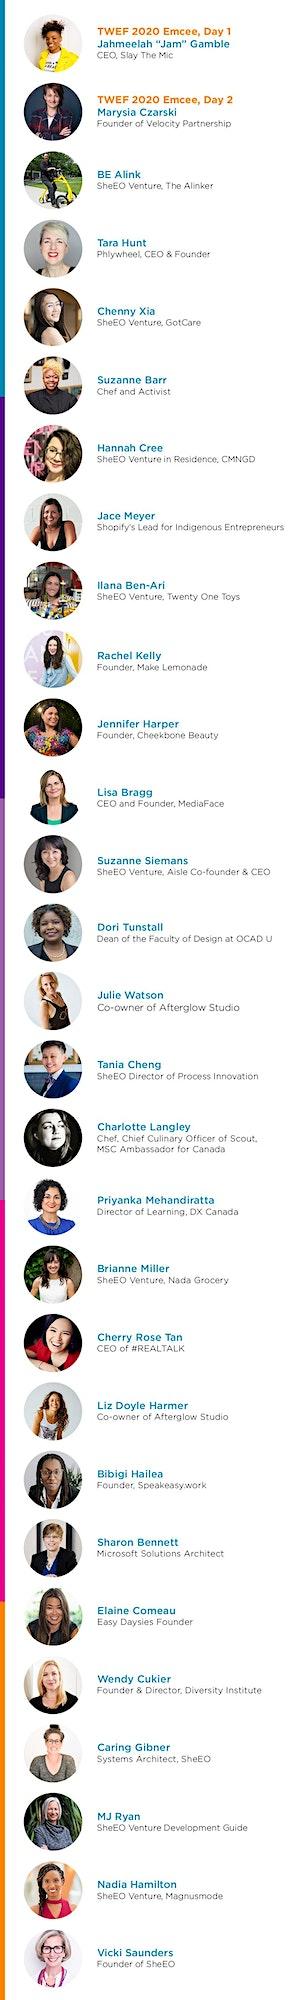 Toronto Women's Entrepreneurship Forum 2020 image